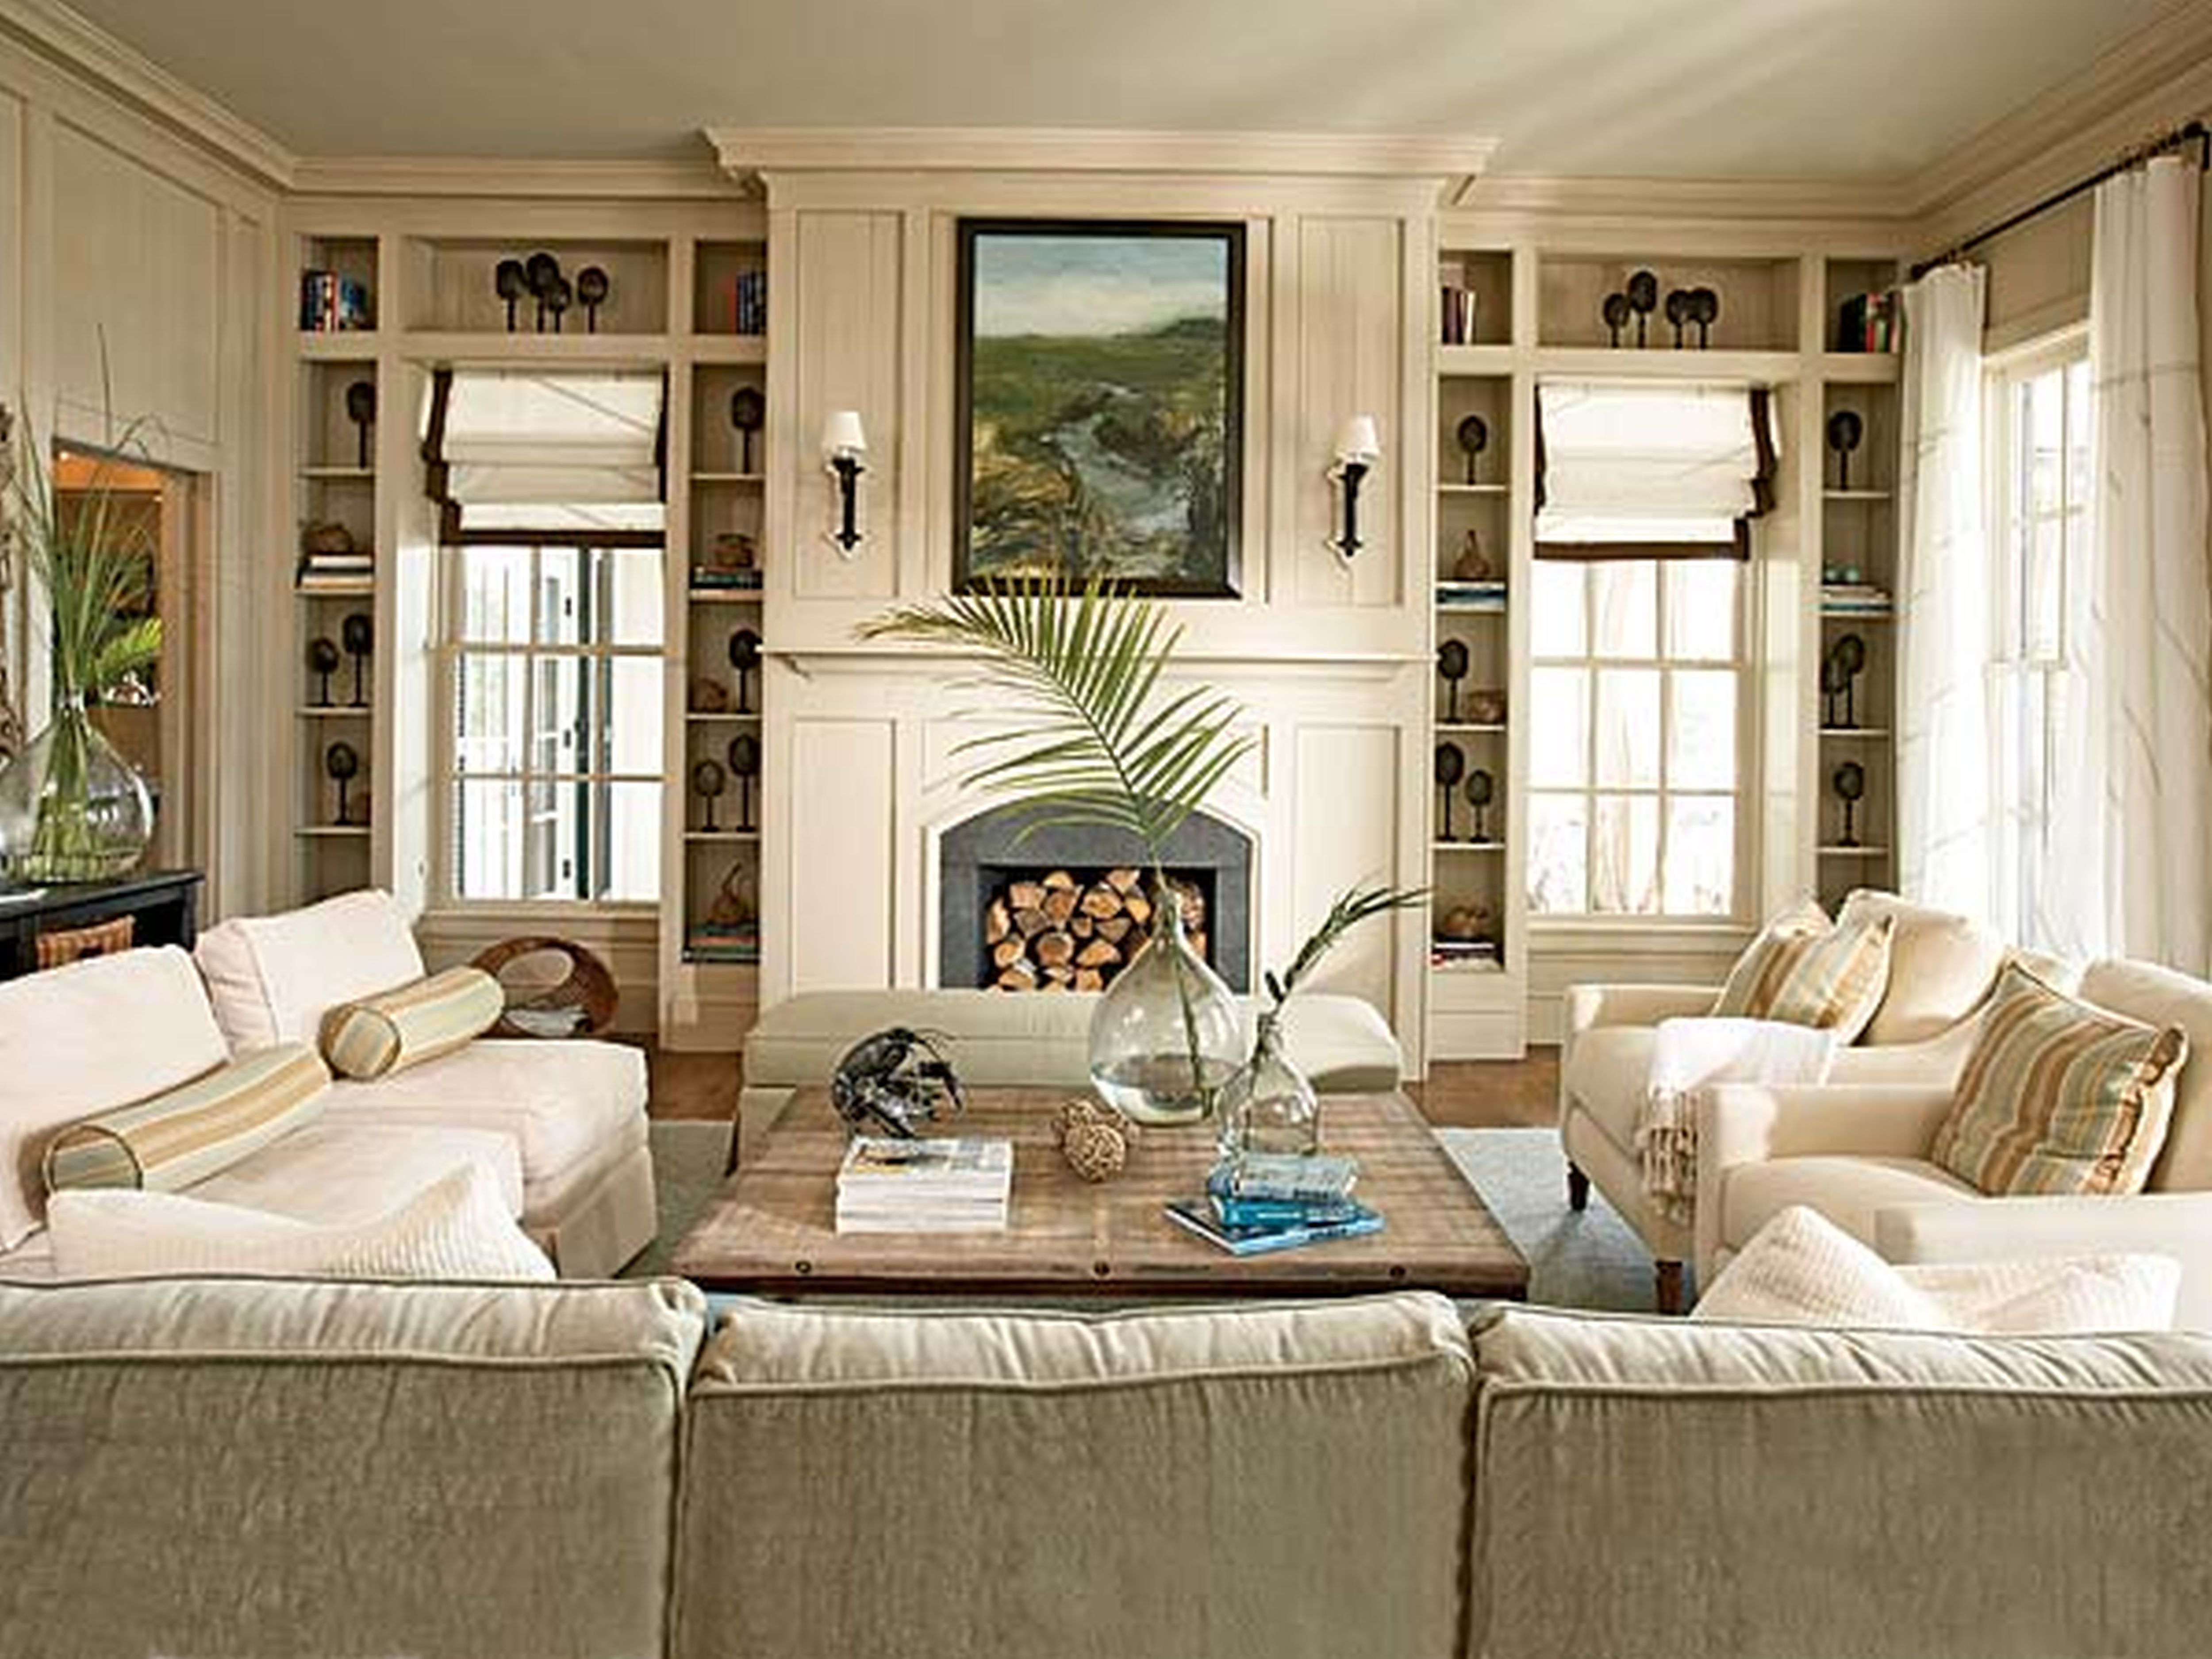 Decorating Peachy Nautical Living Room Coastal Theme ...